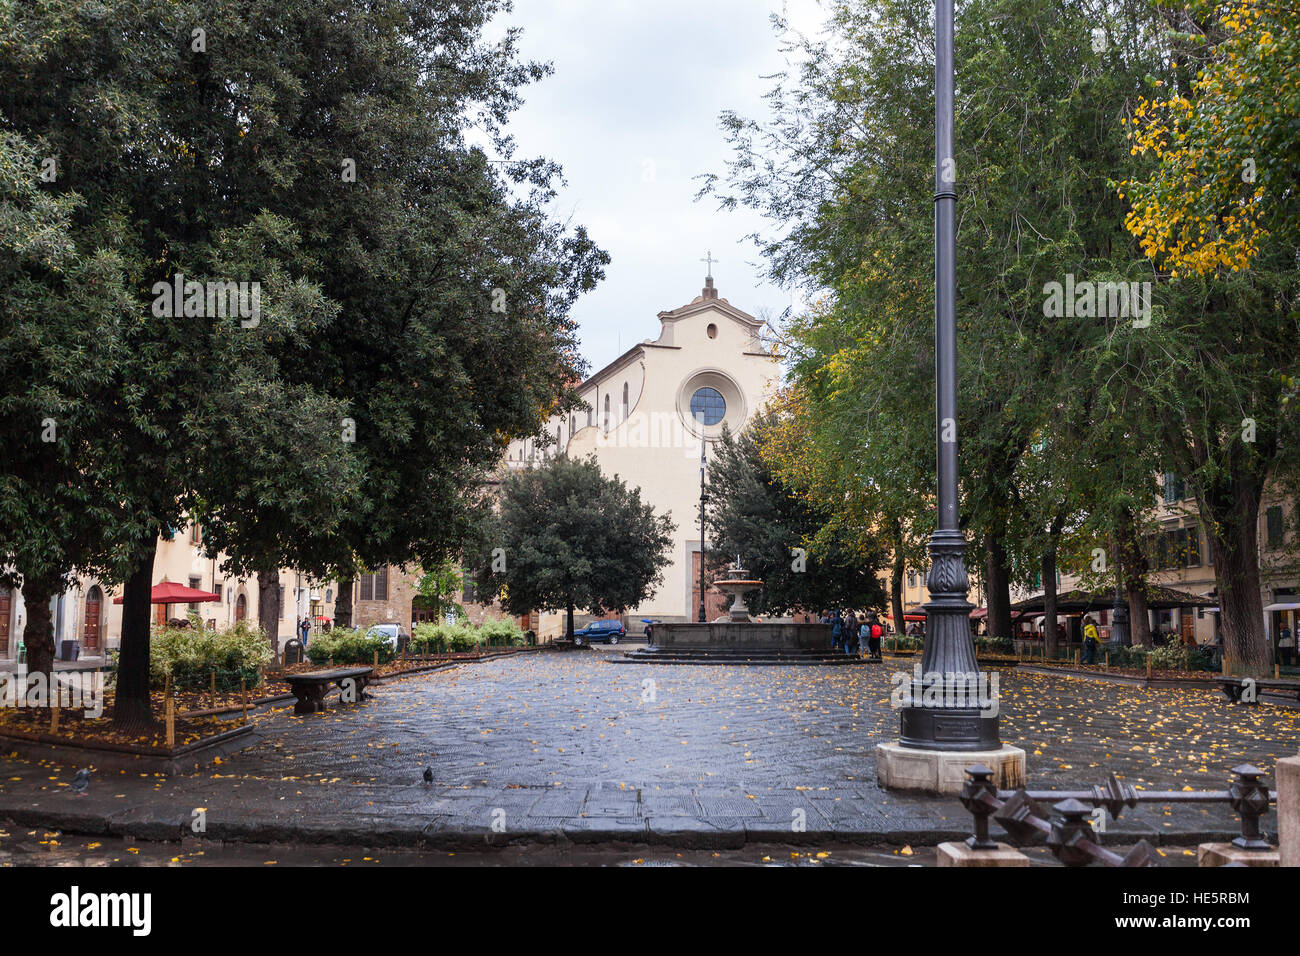 travel to Italy - Piazza Santo Spirito with fountain and Basilica di Santo Spirito in Florence city in autumn Stock Photo